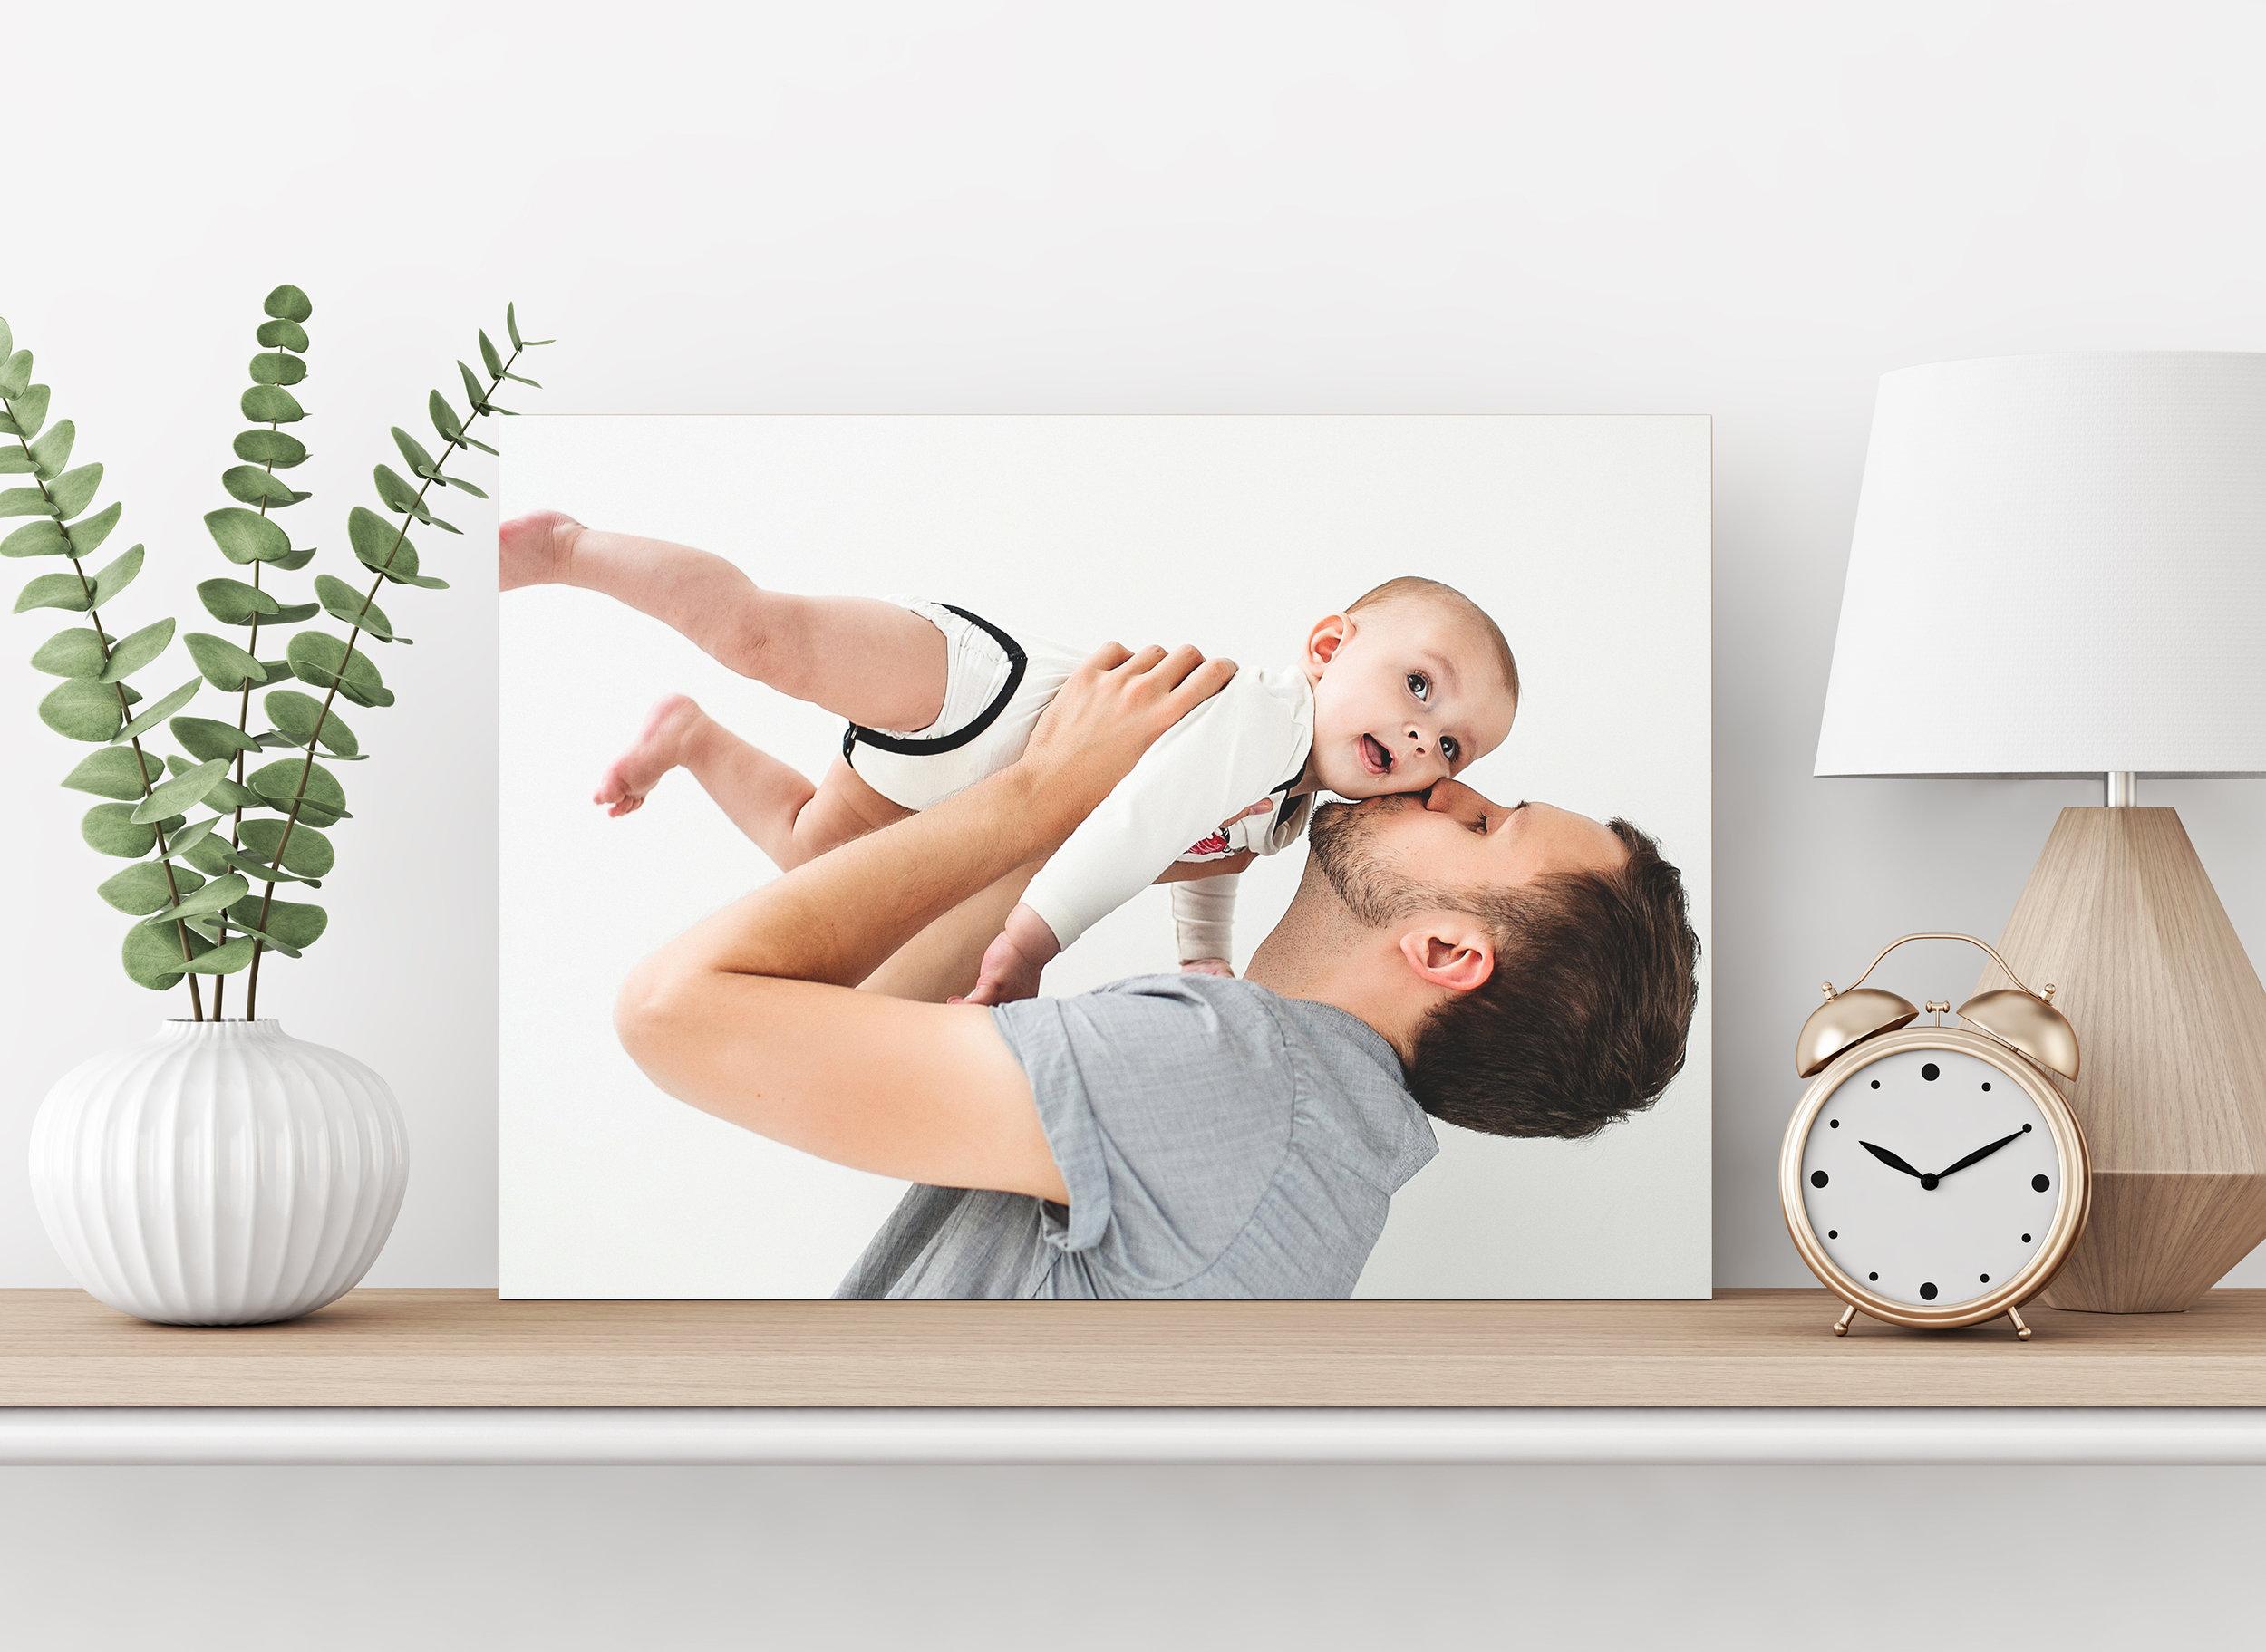 Canvas-Home-decor-15.jpg